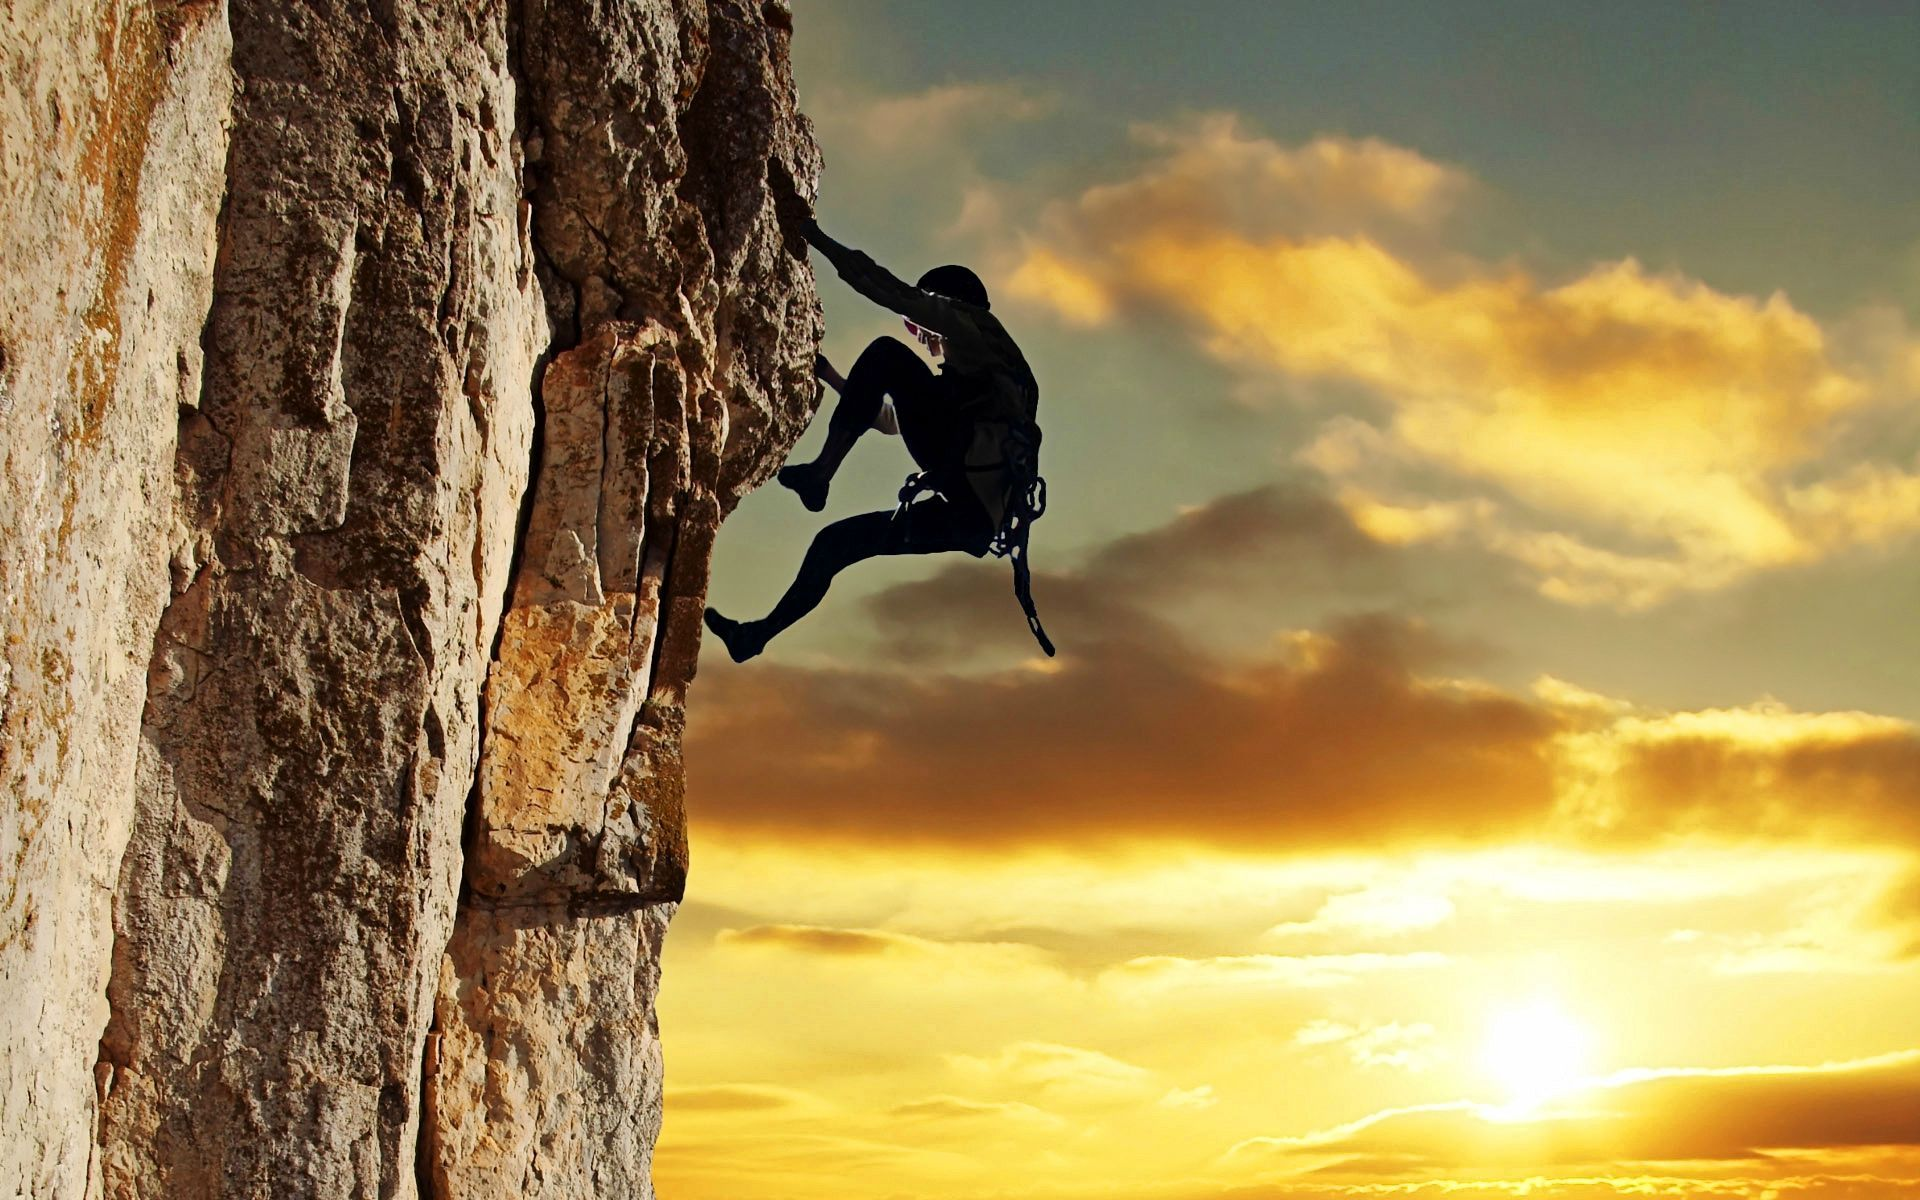 Rock Climbing Wallpaper Hd Wide Hd Wallpapers